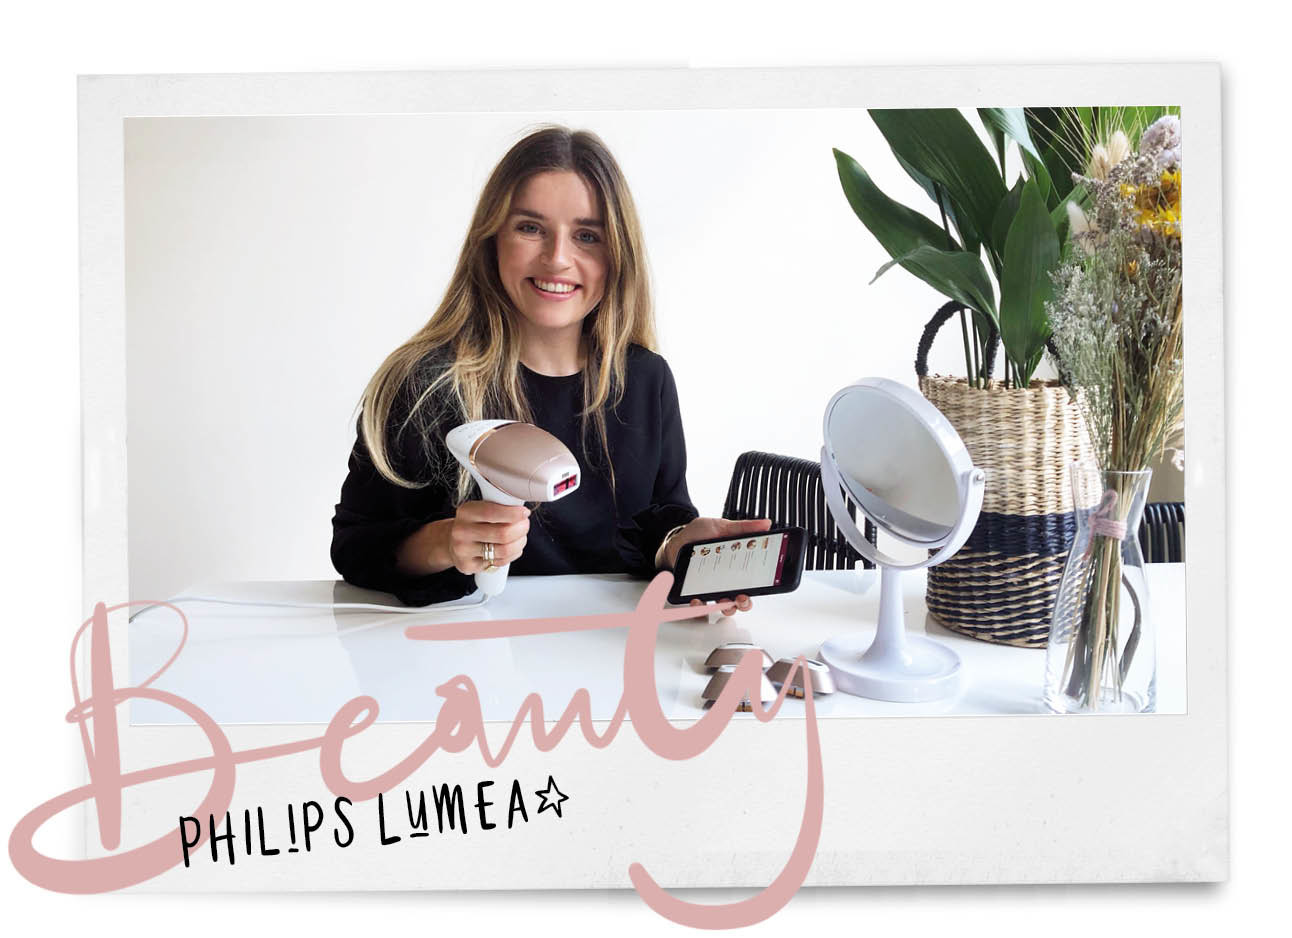 lotte in de keuken met de philips lumea, app en spiegel